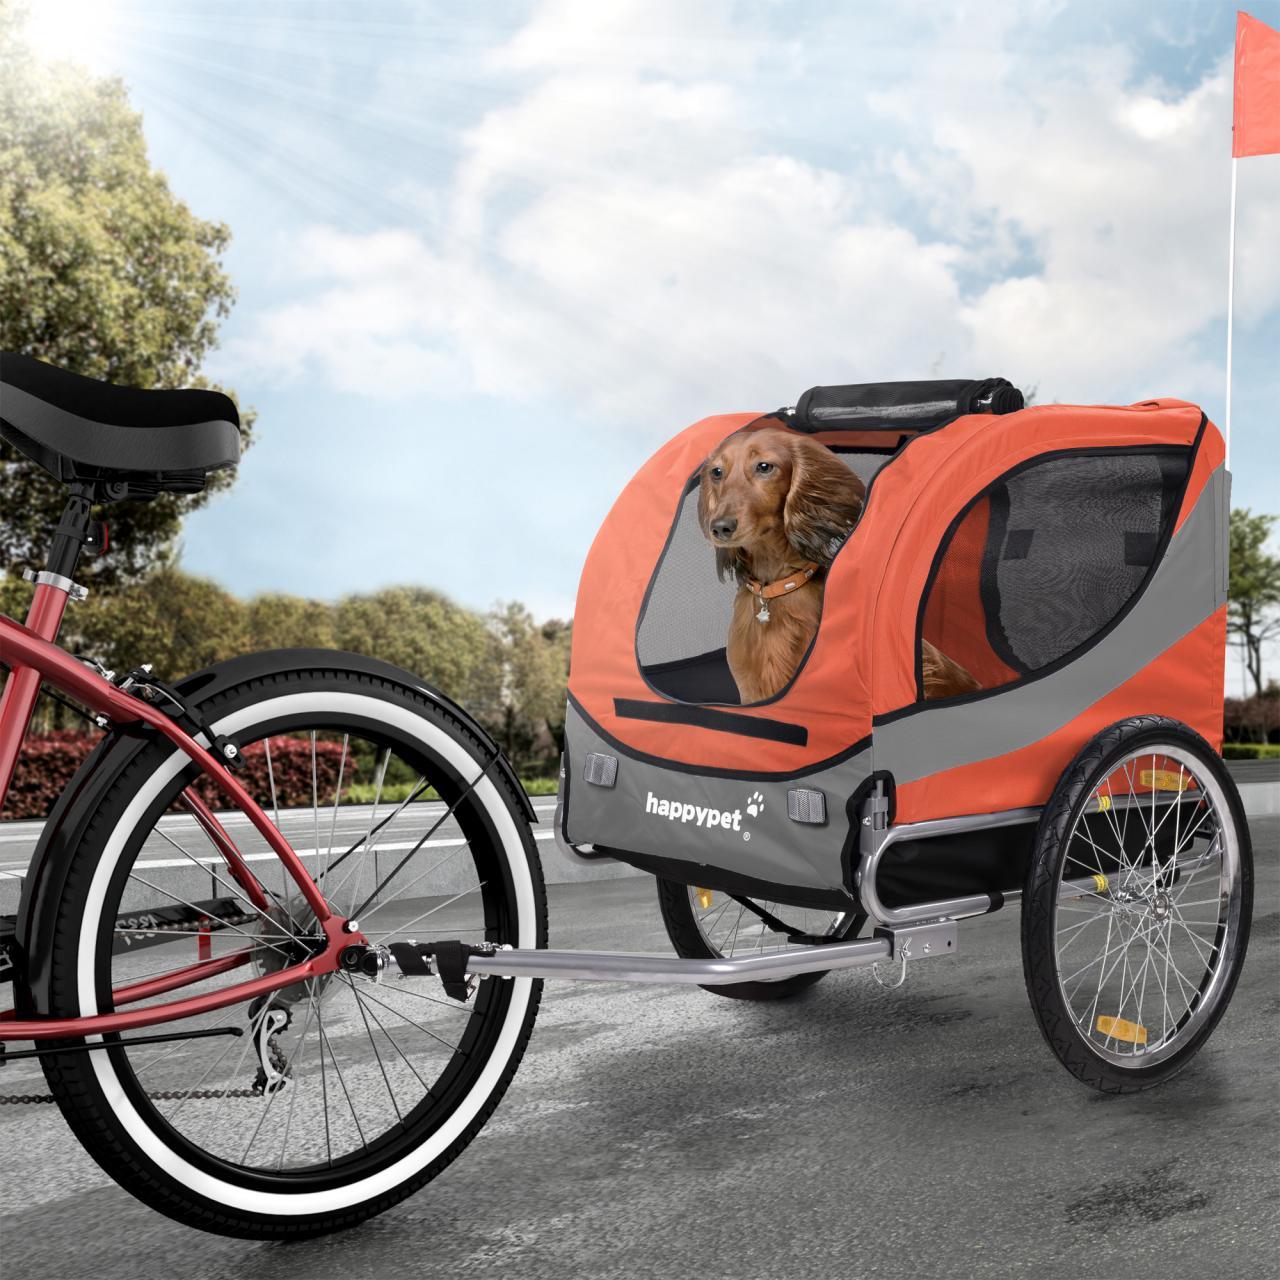 HAPPYPET-Hunde-Fahrrad-Anhaenger-M-Hundetransporter-Hundeanhaenger-Tier-FARBWAHL